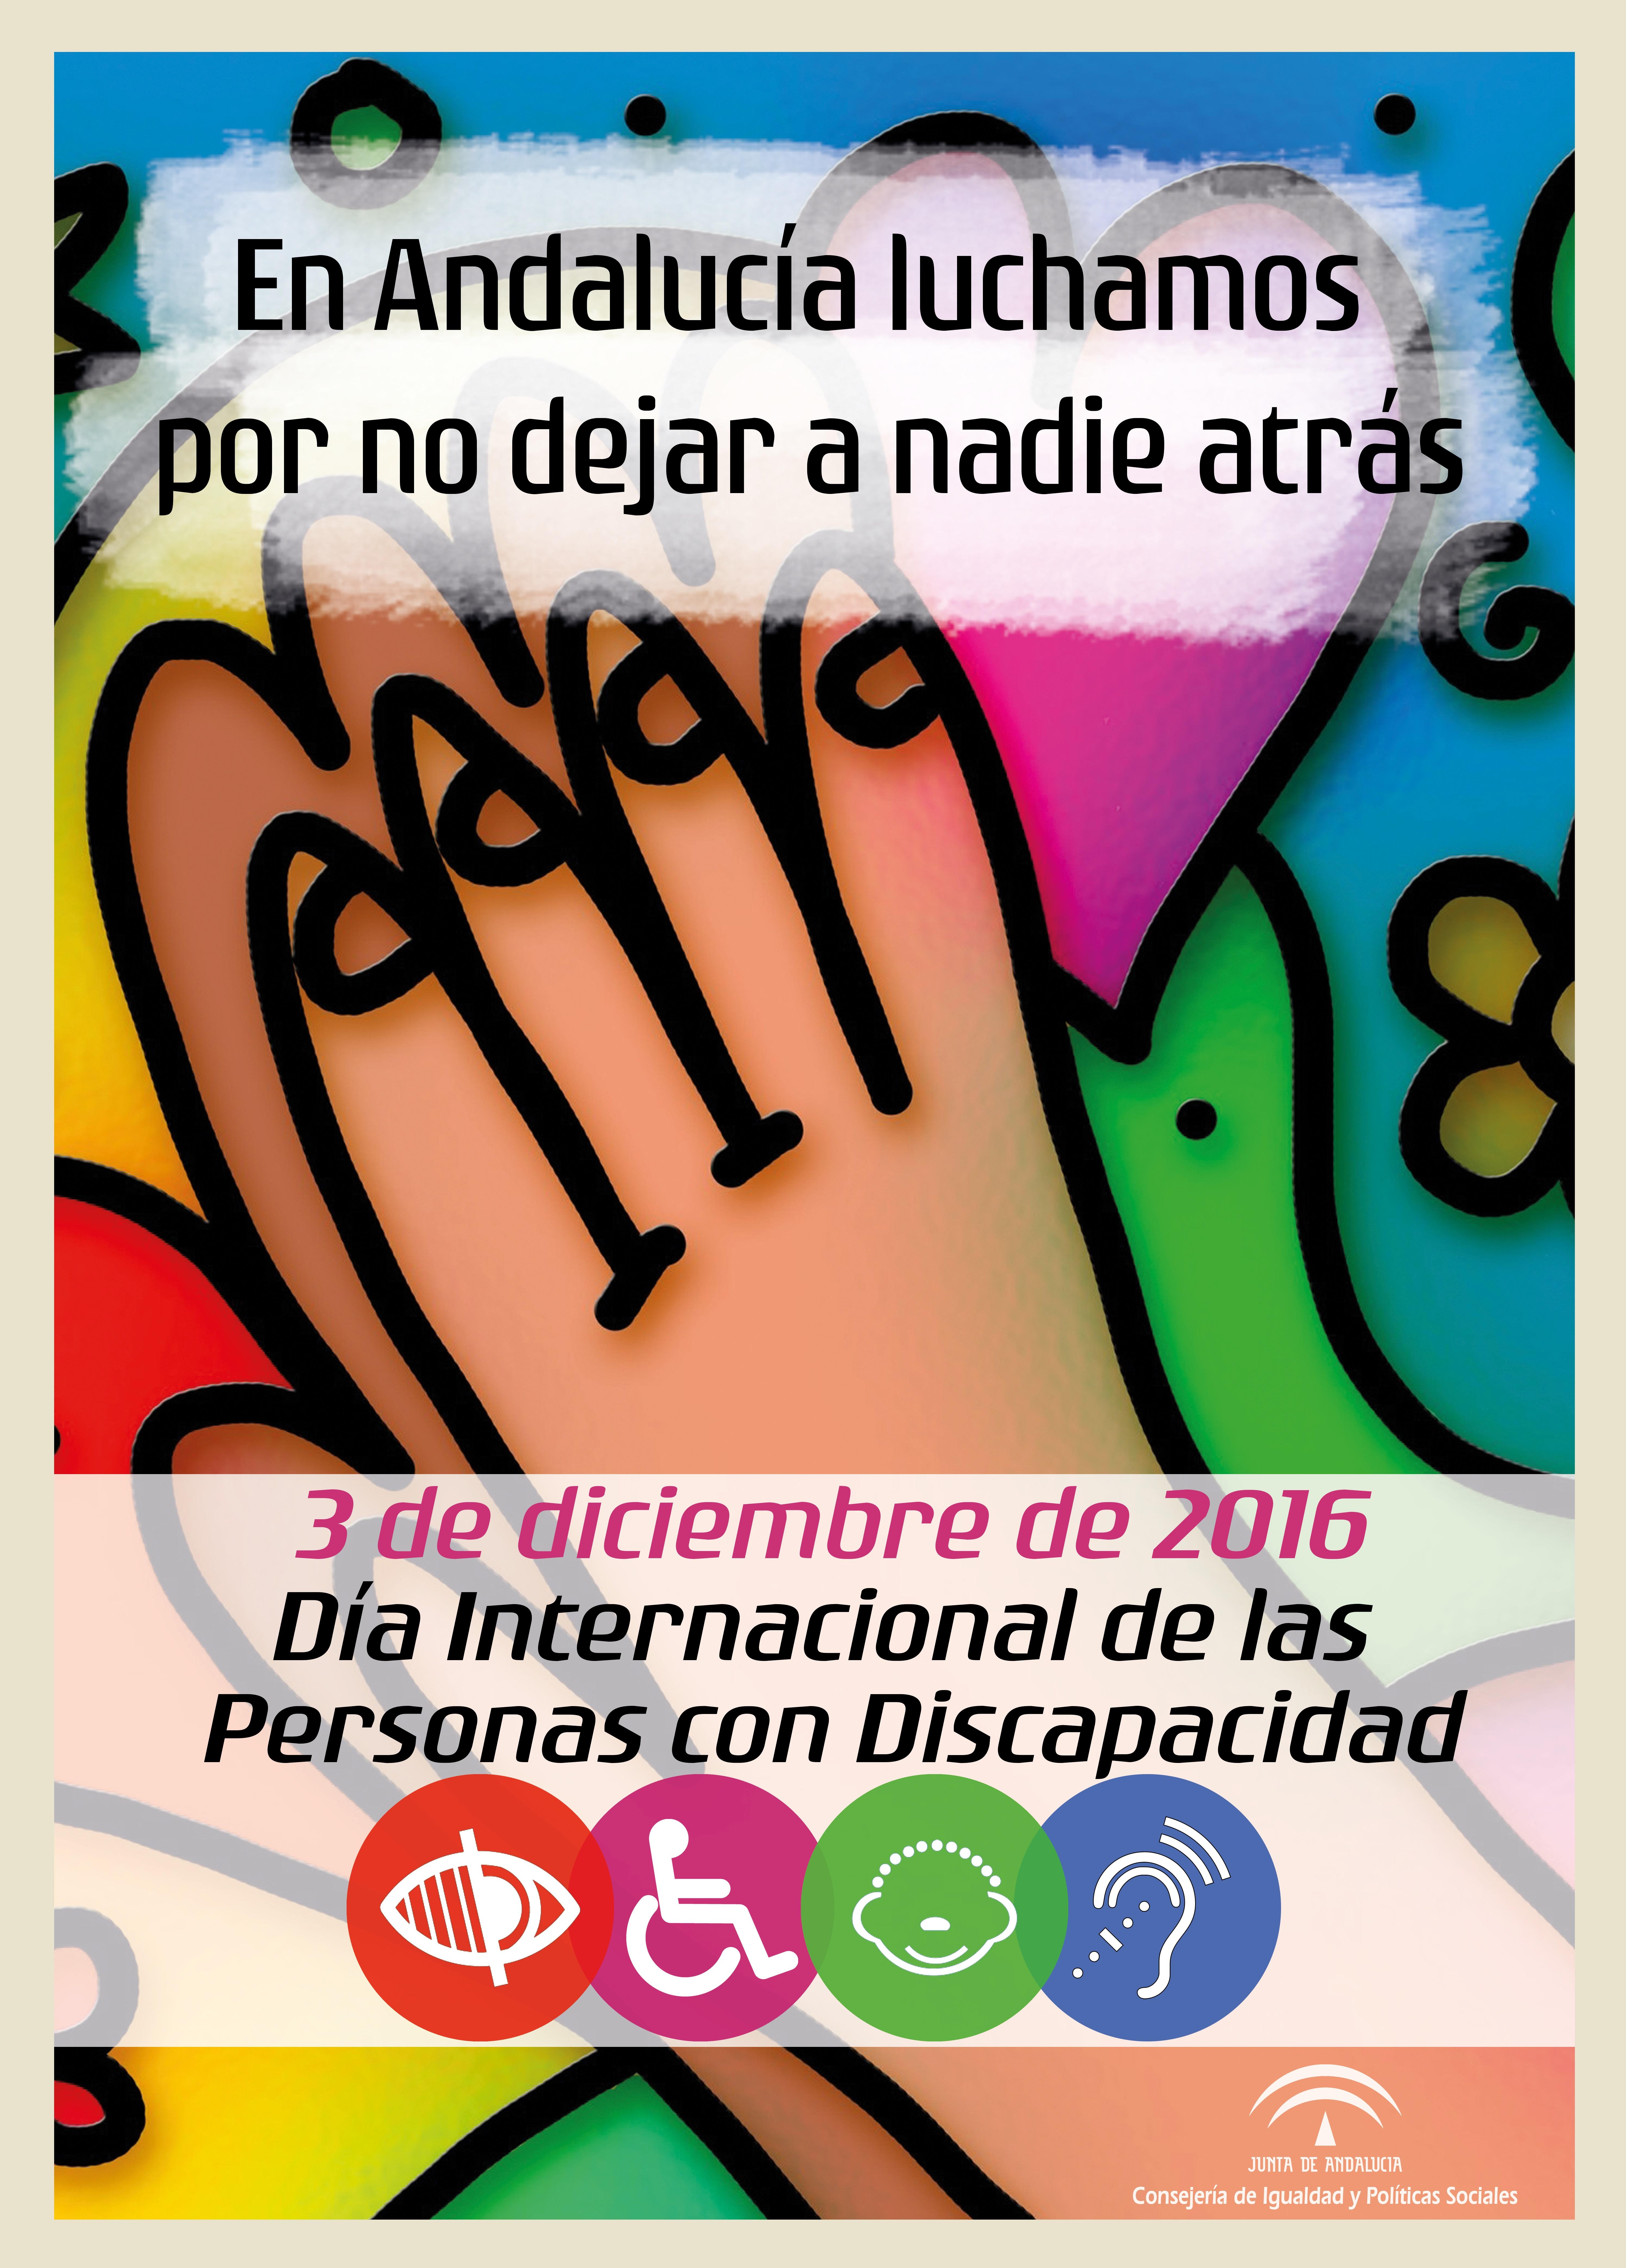 http://www.juntadeandalucia.es/export/drupaljda/Cartel%20Discapacidad(50x70)-Compacto.jpg